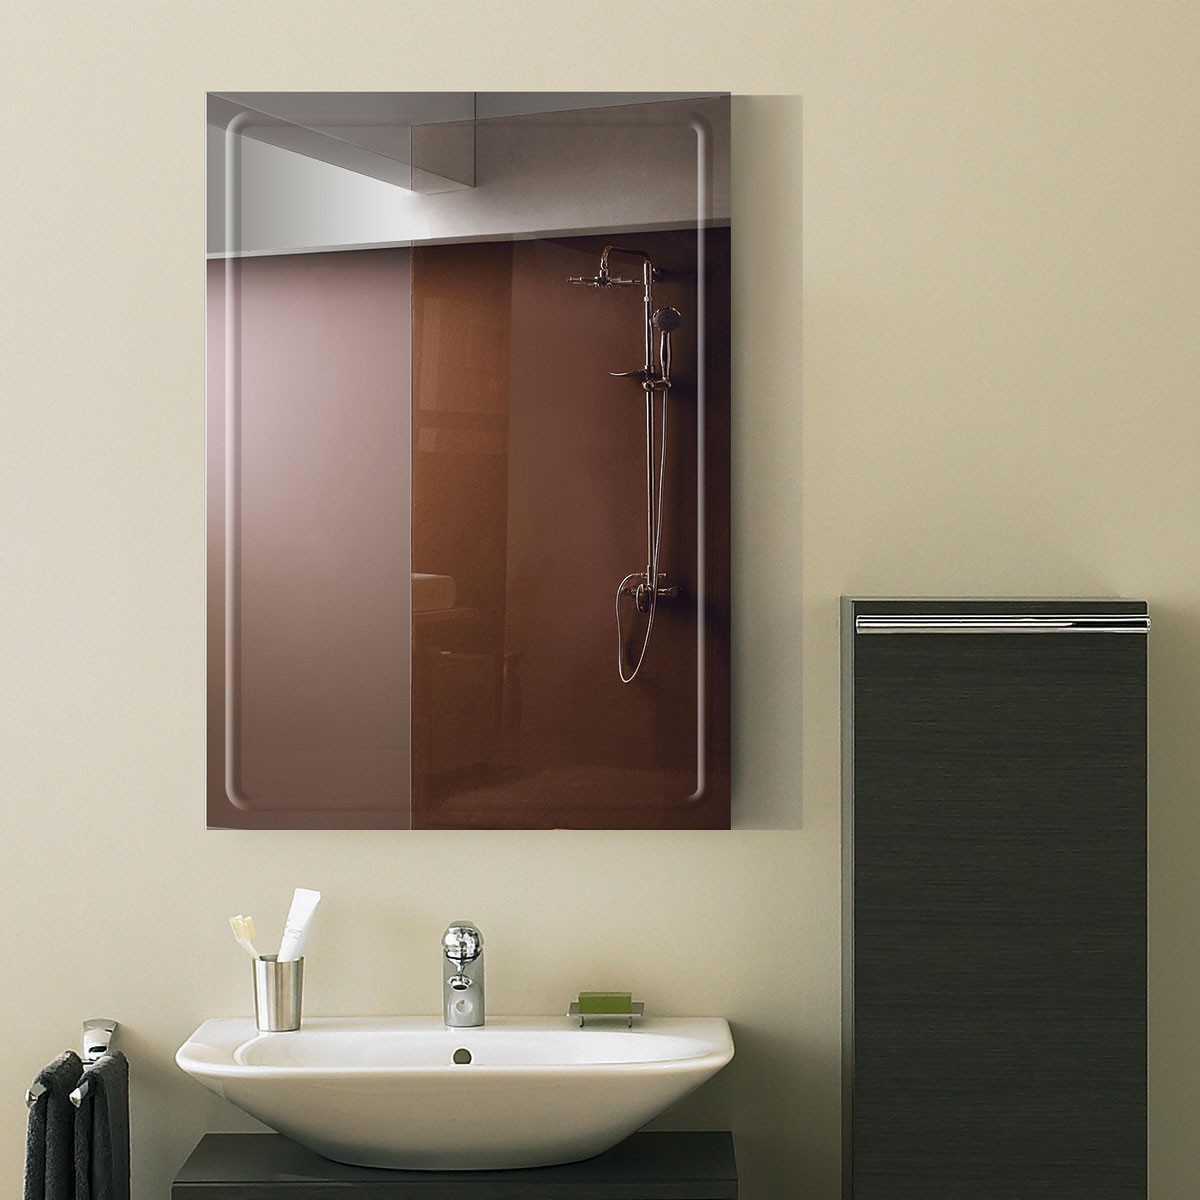 28 x 20 po miroir mural salle de bain classique for Miroir mural sans cadre